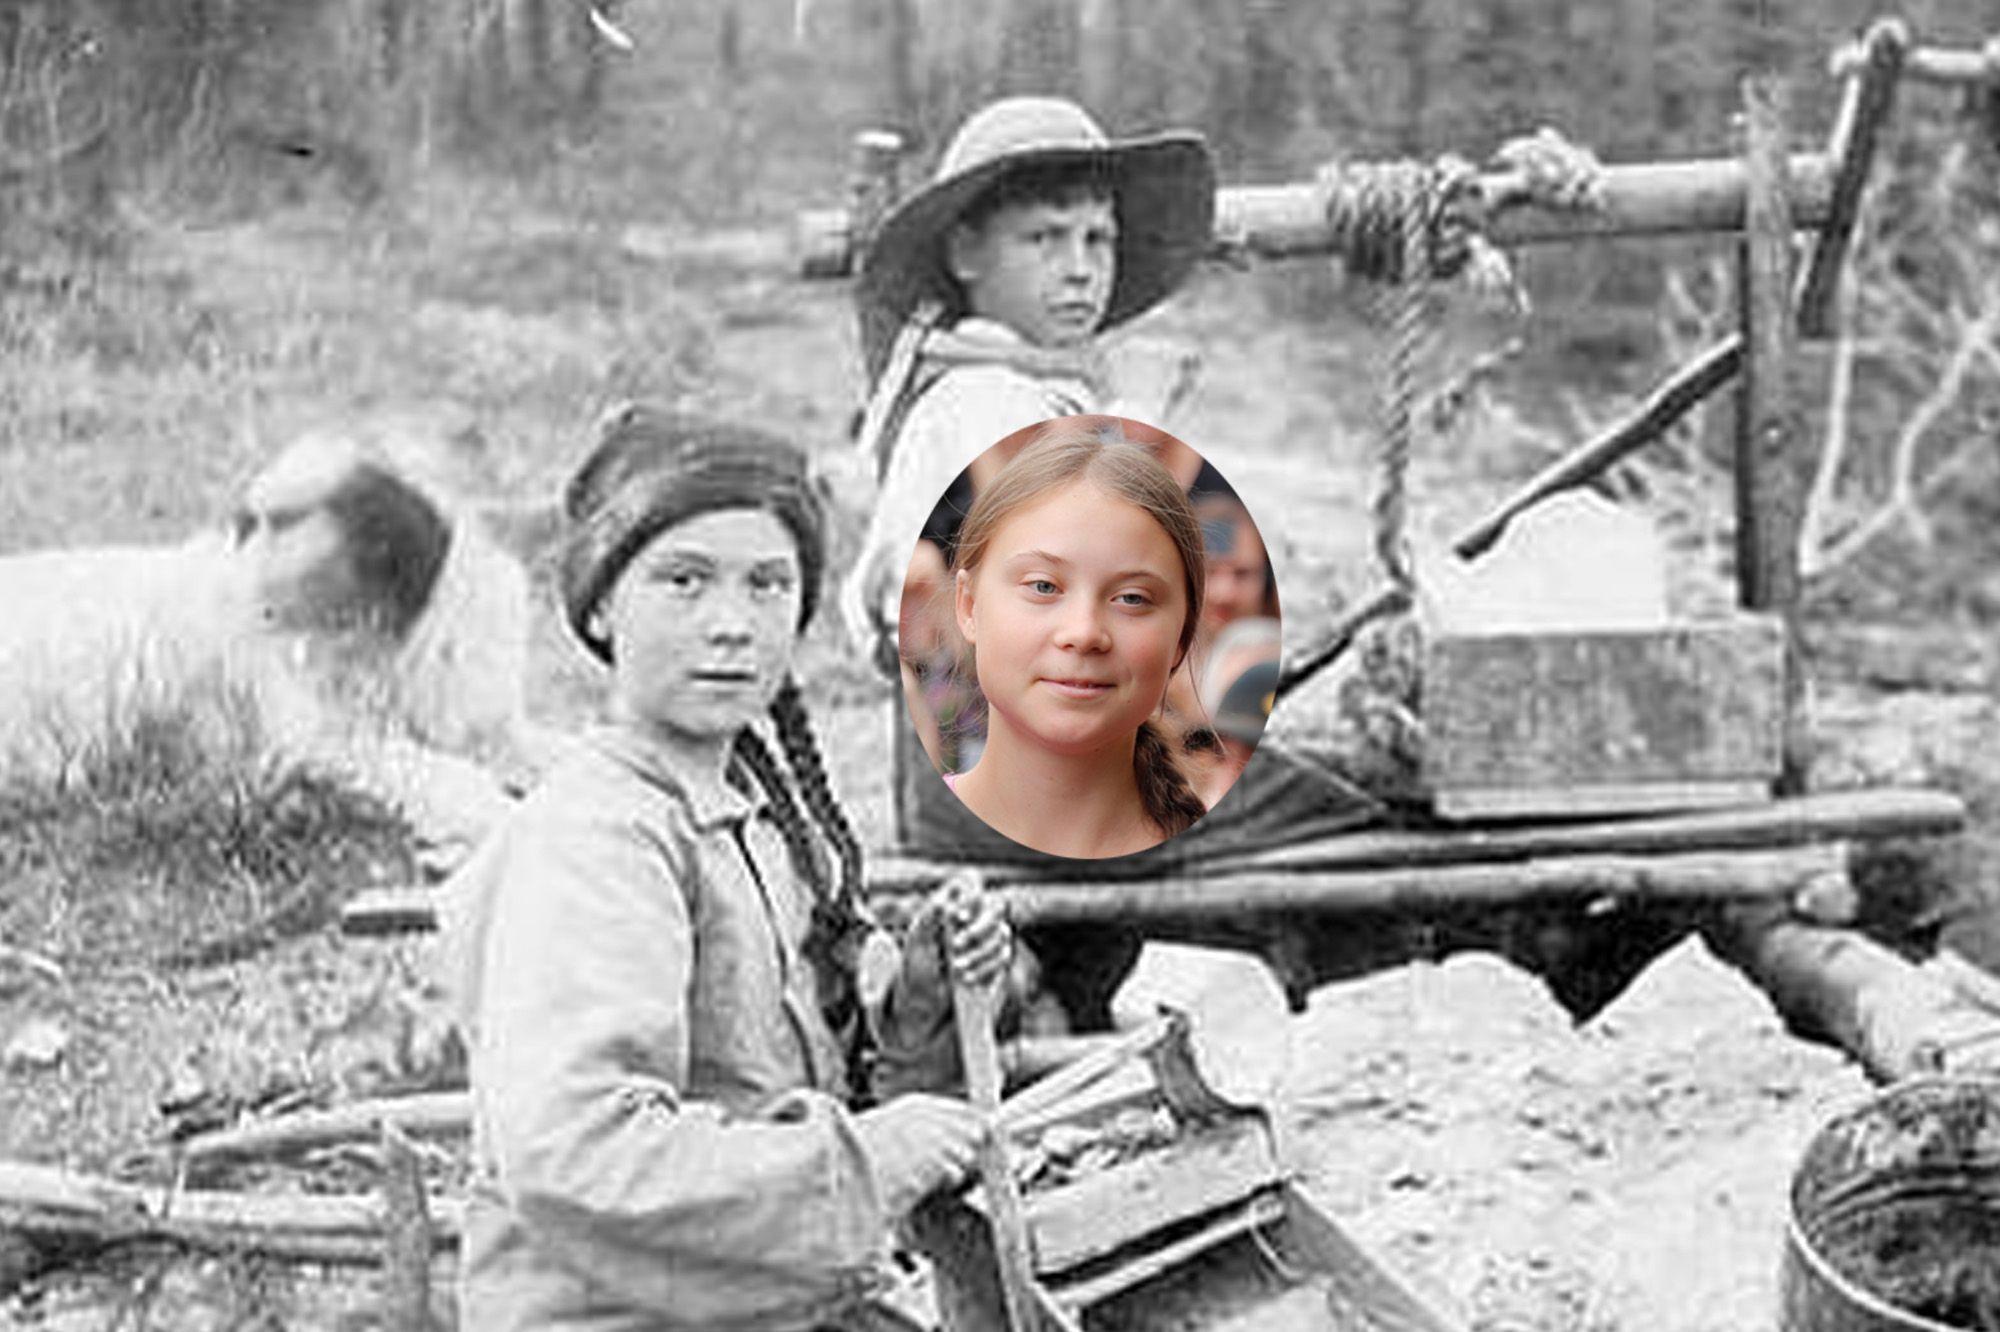 Greta-Thunberg-voyageuse-temporelle.jpg